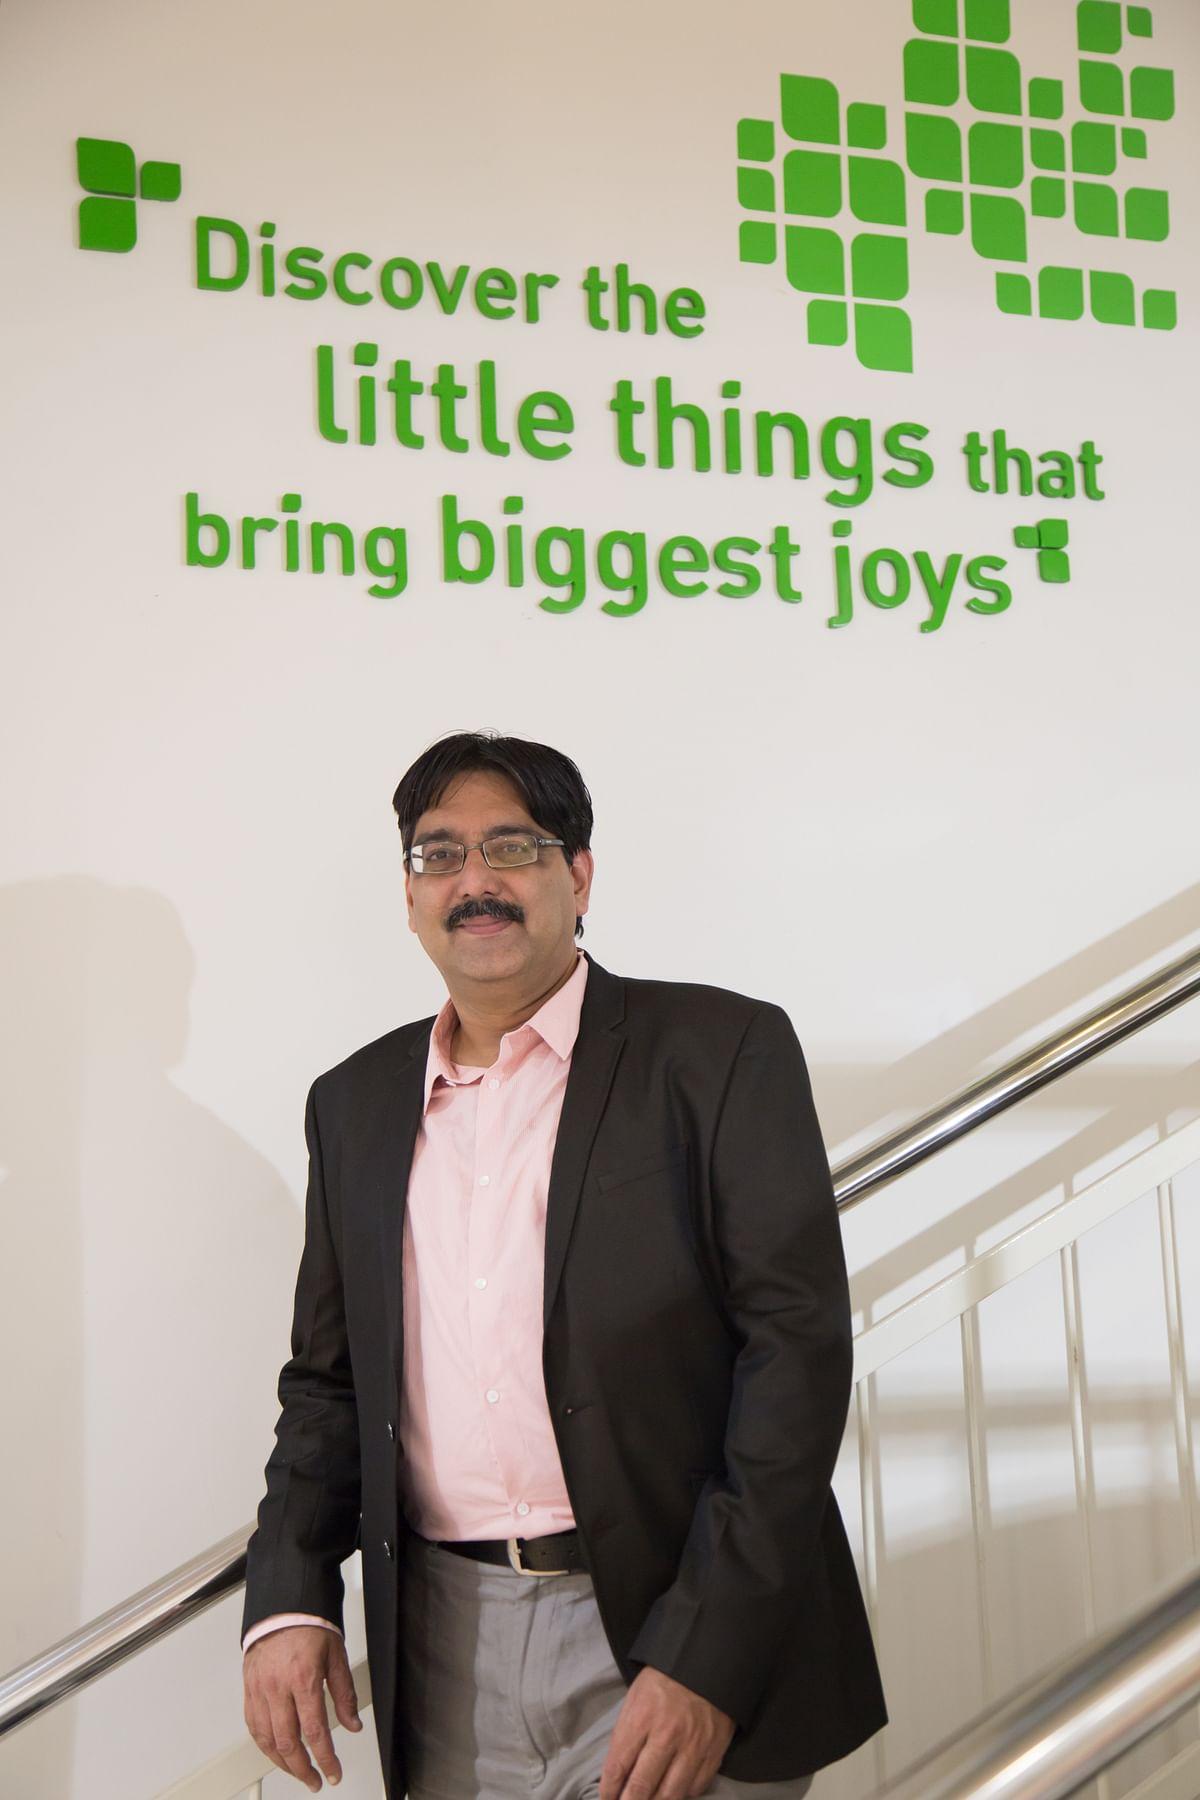 Creaticity's CEO Mahesh M